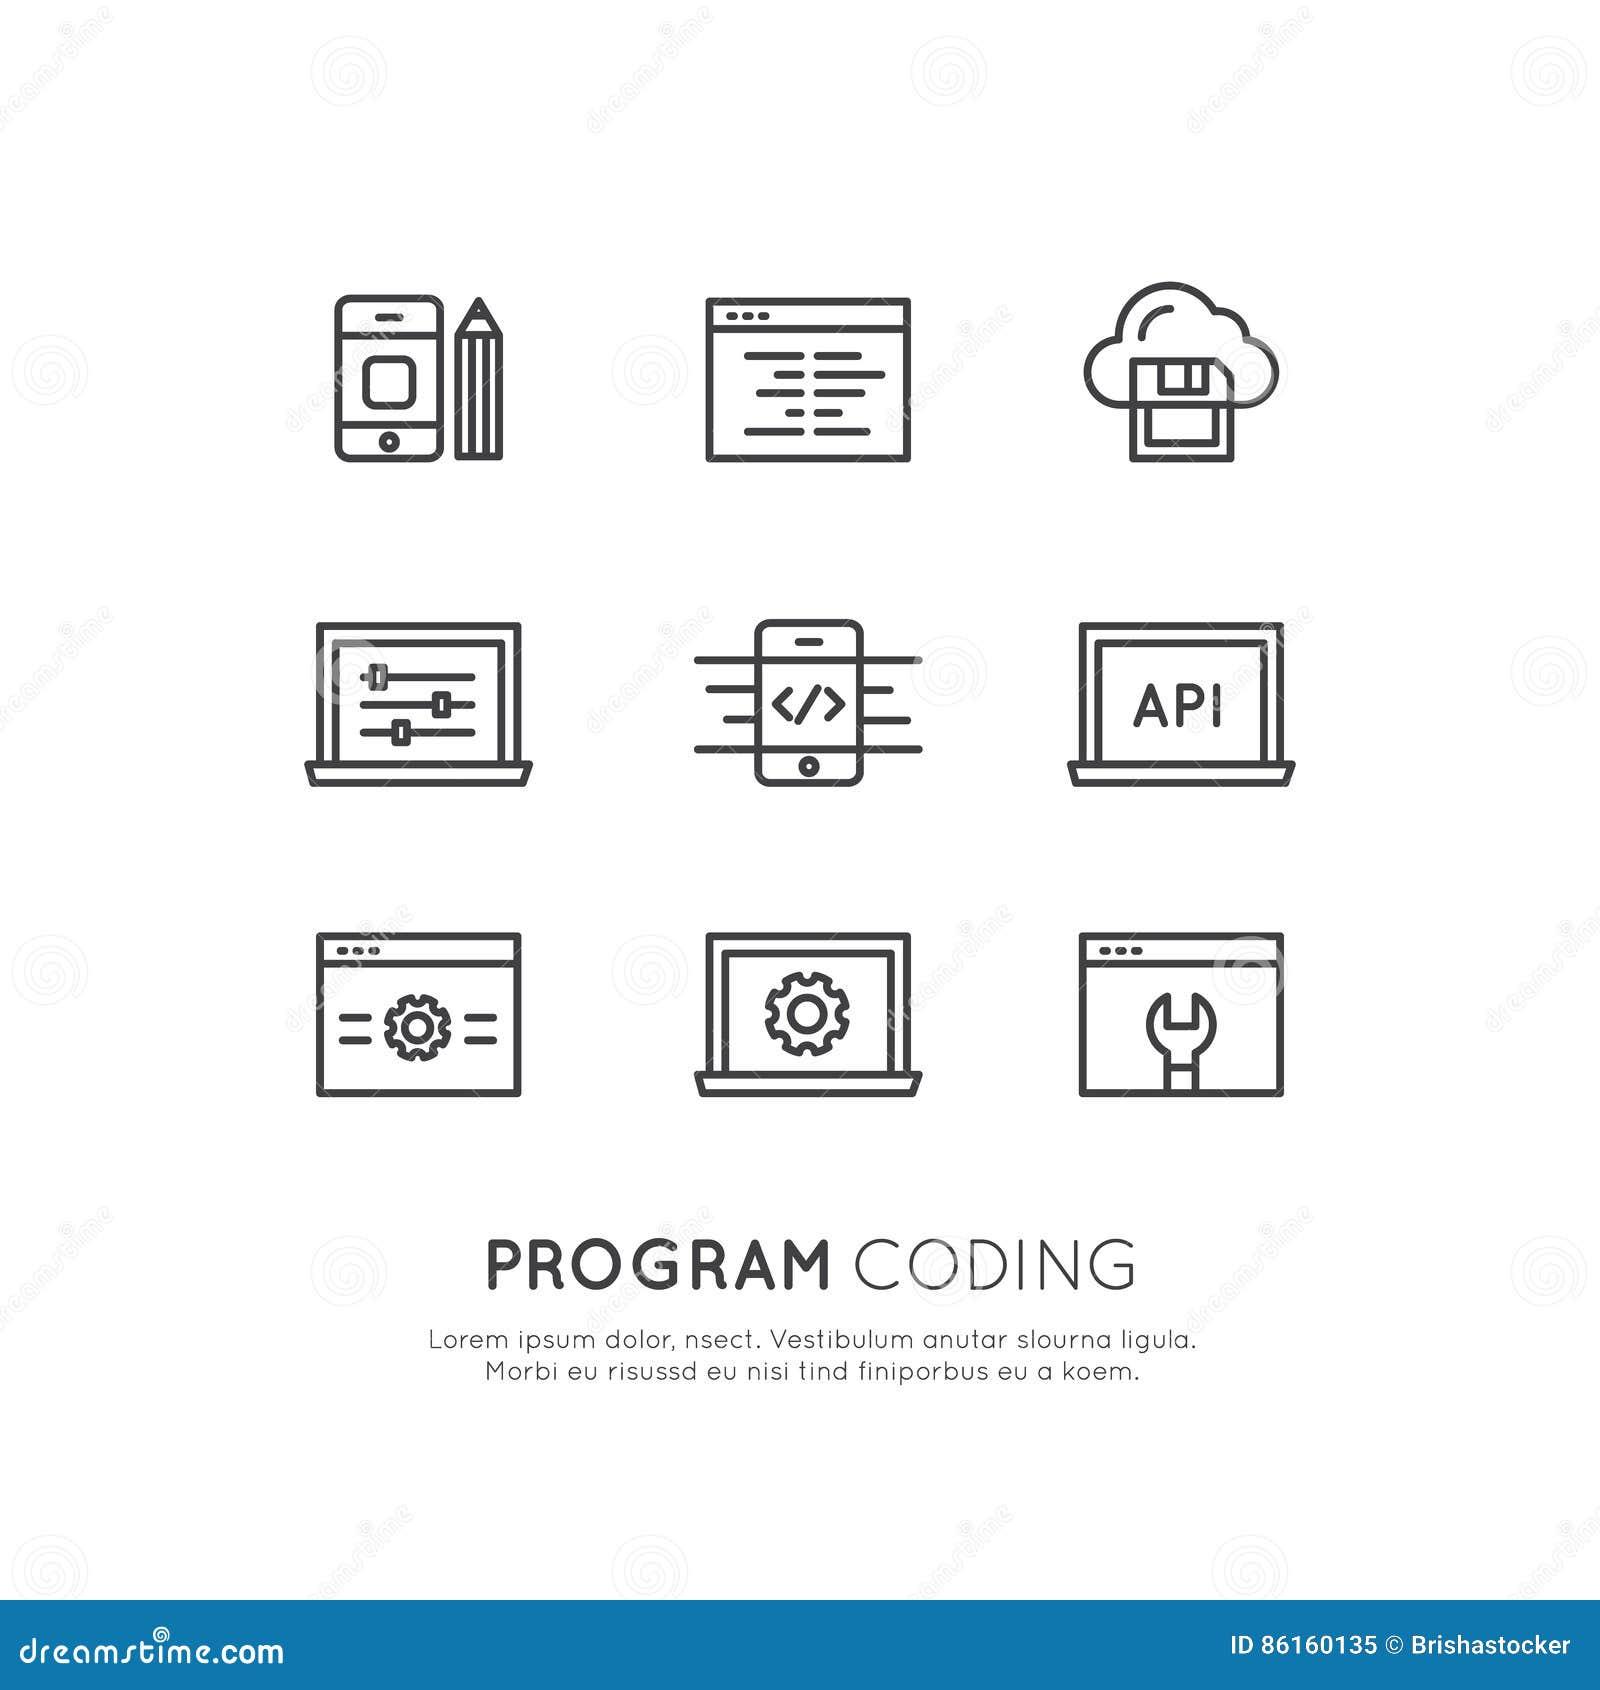 Set of Program Coding App for Mobile and Web, SEO, Optimization, IT Development Process